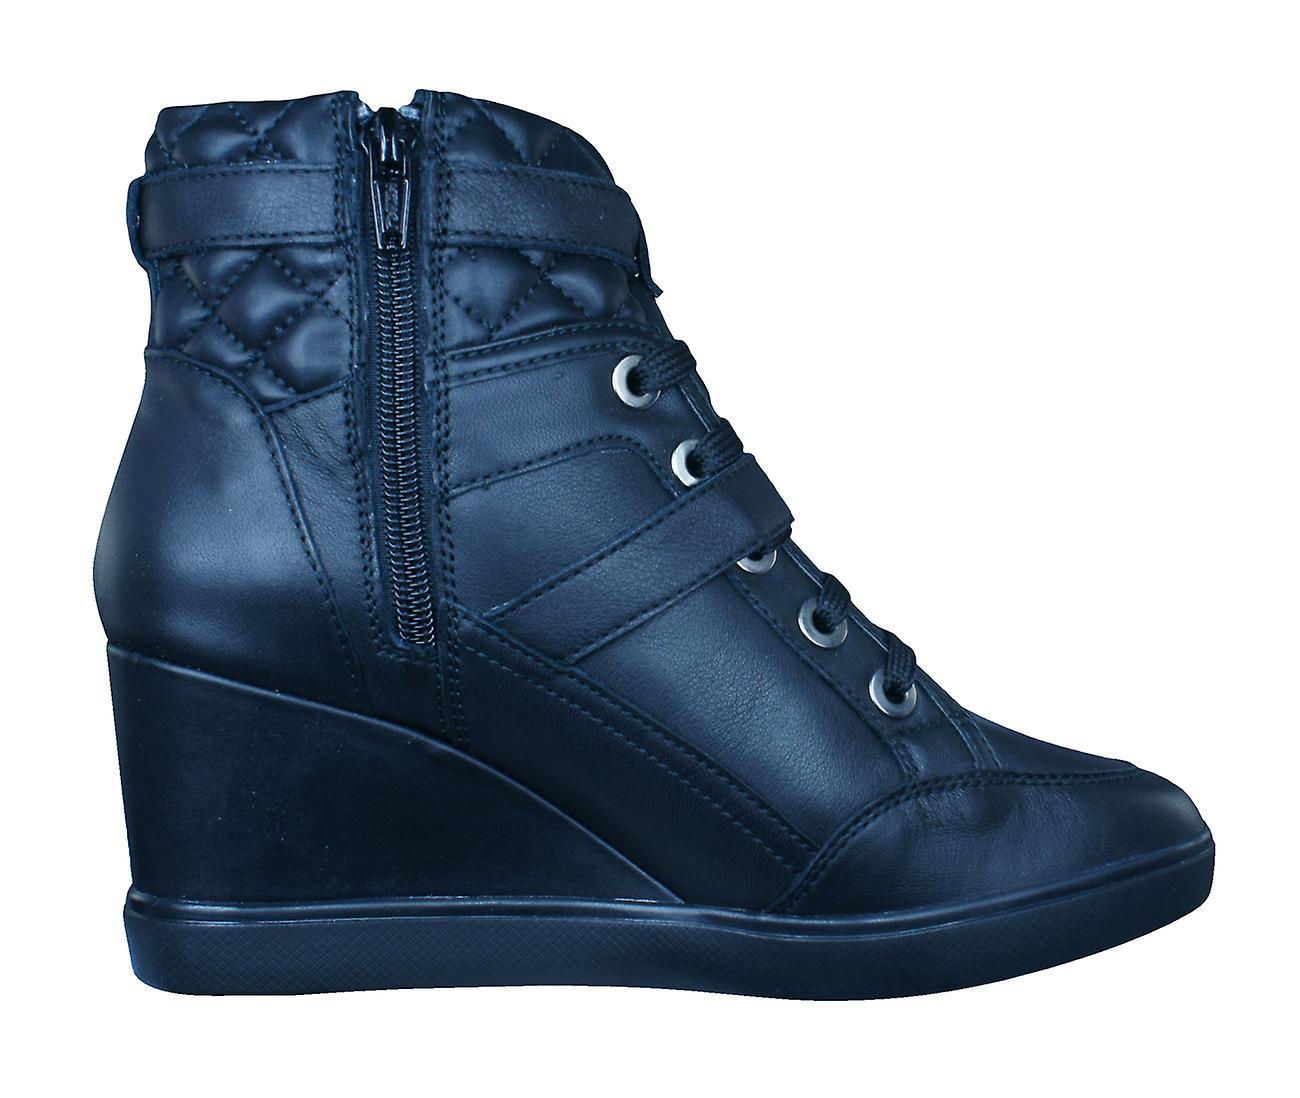 Geox D Eleni C Womens Nappa skinn kile trenere / støvler - Black